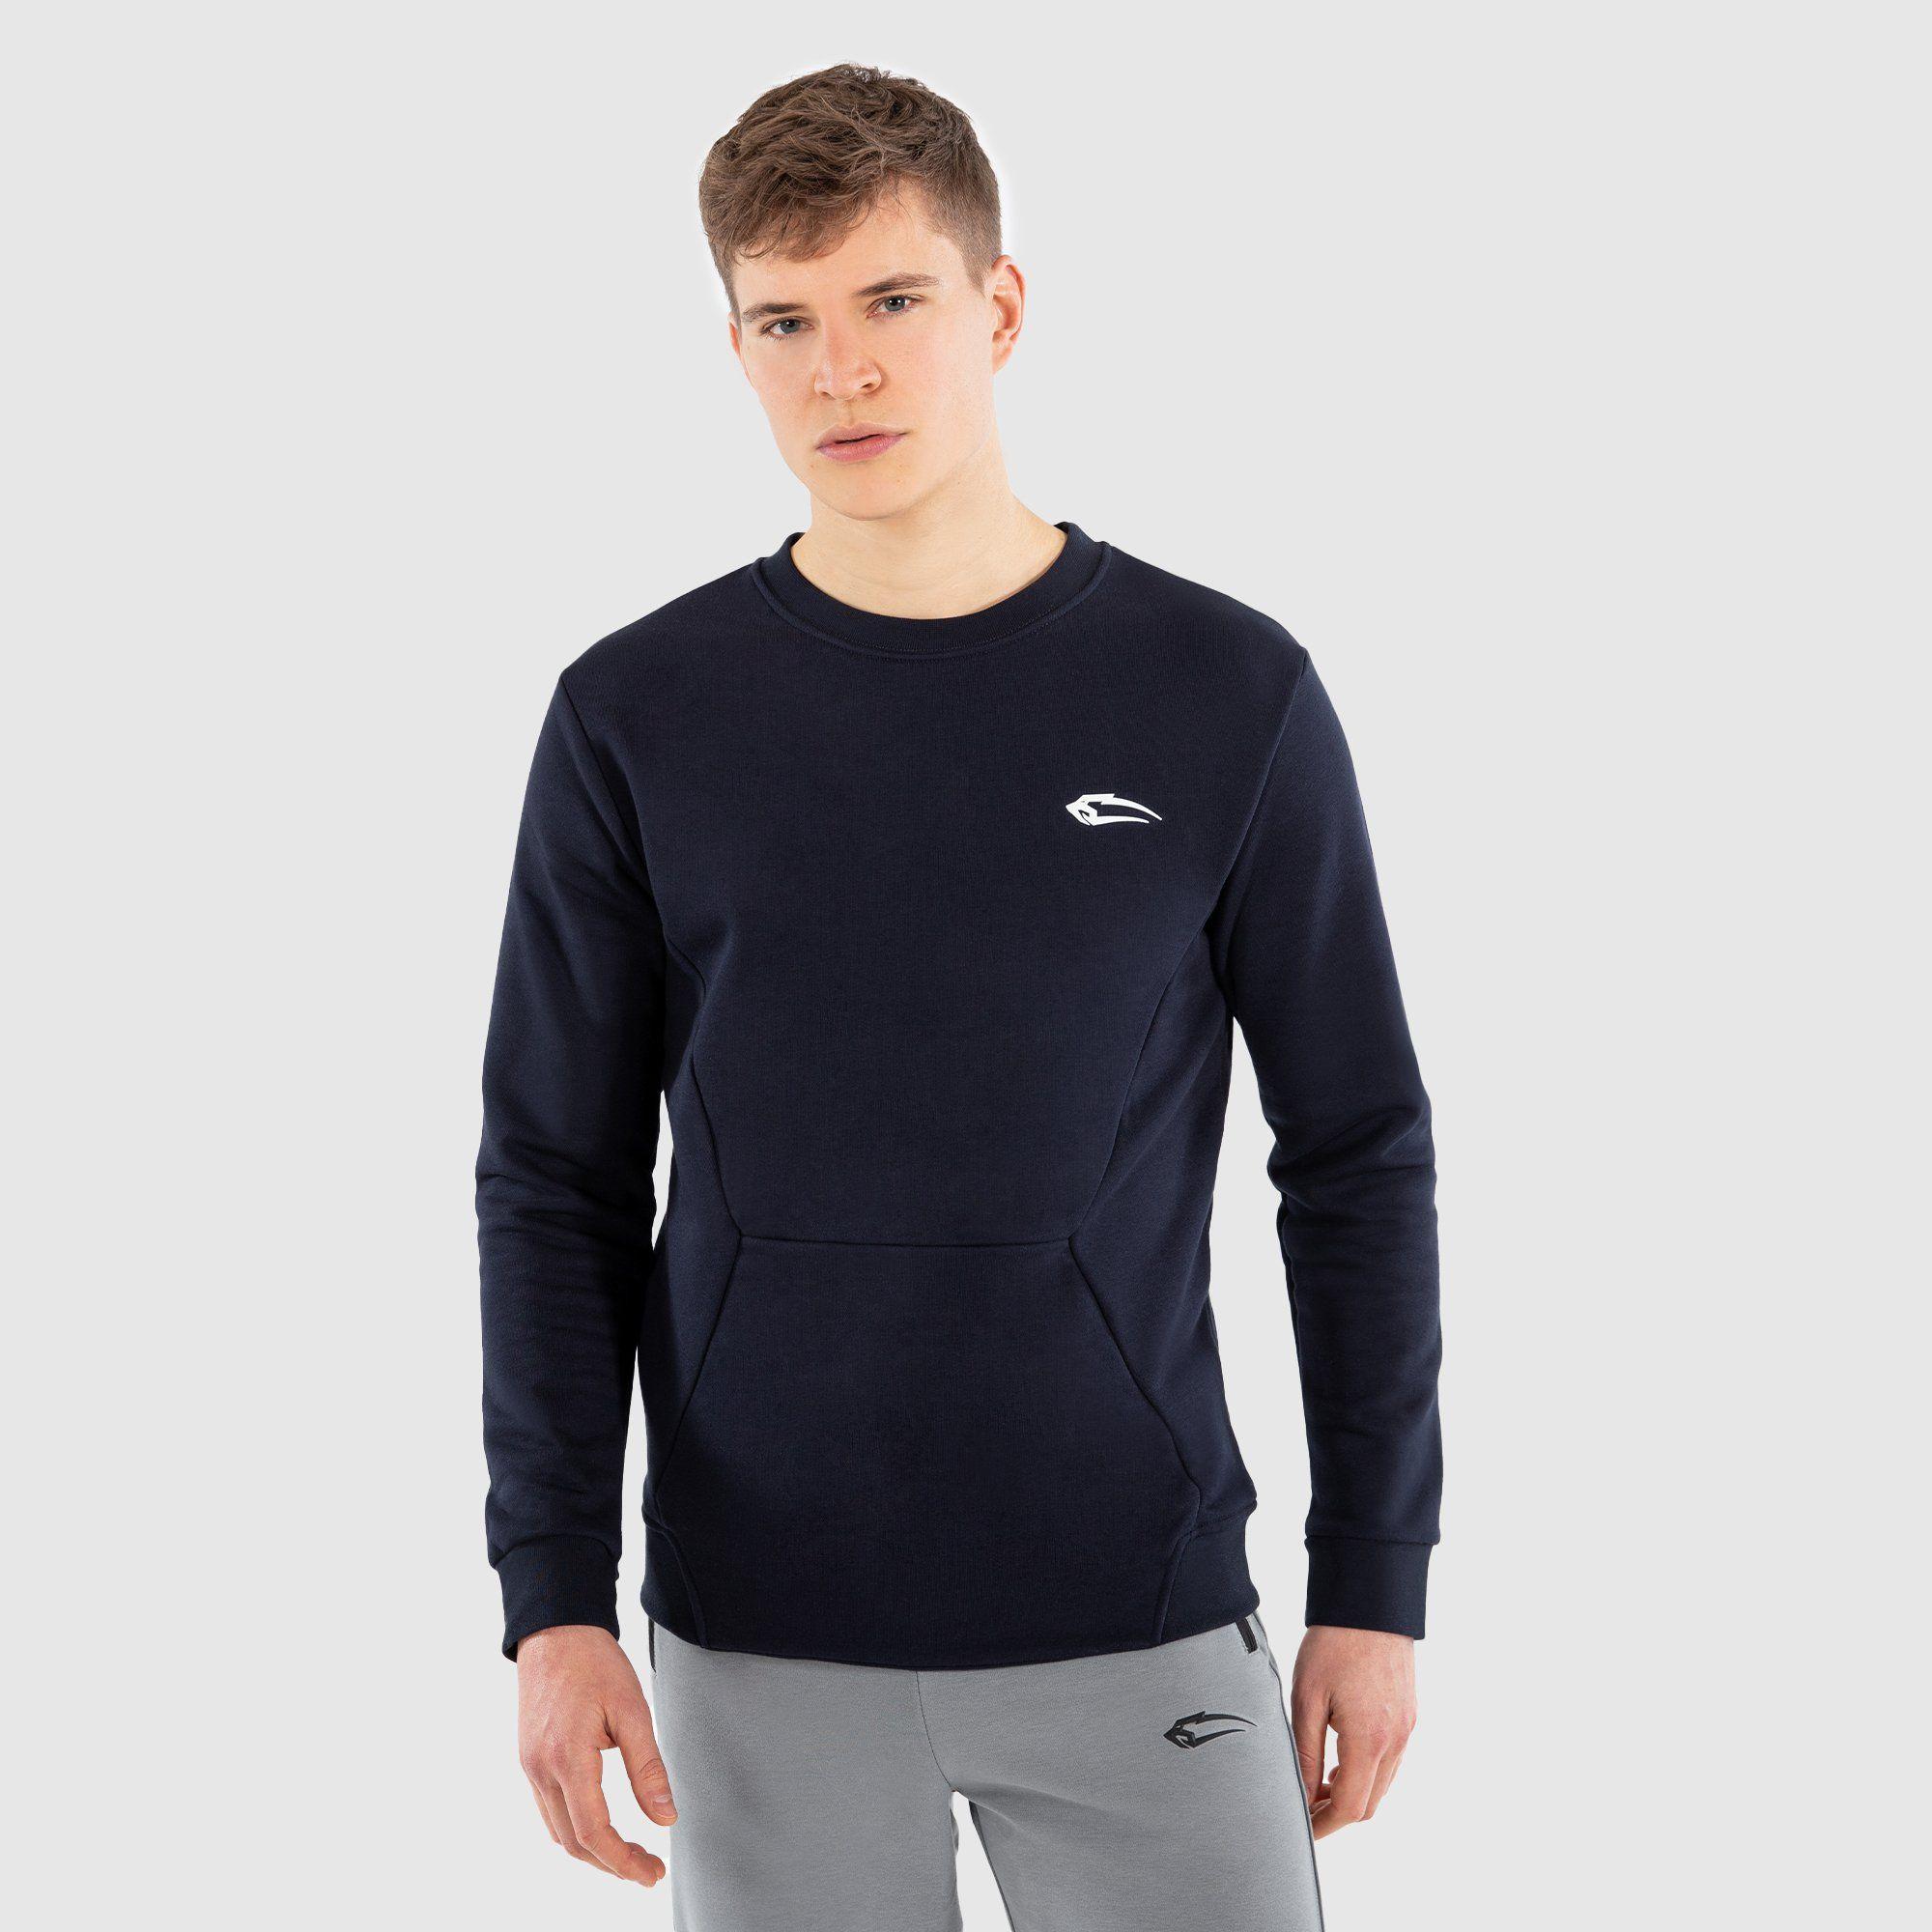 Sweatshirt Rahel – Blau / 3XL